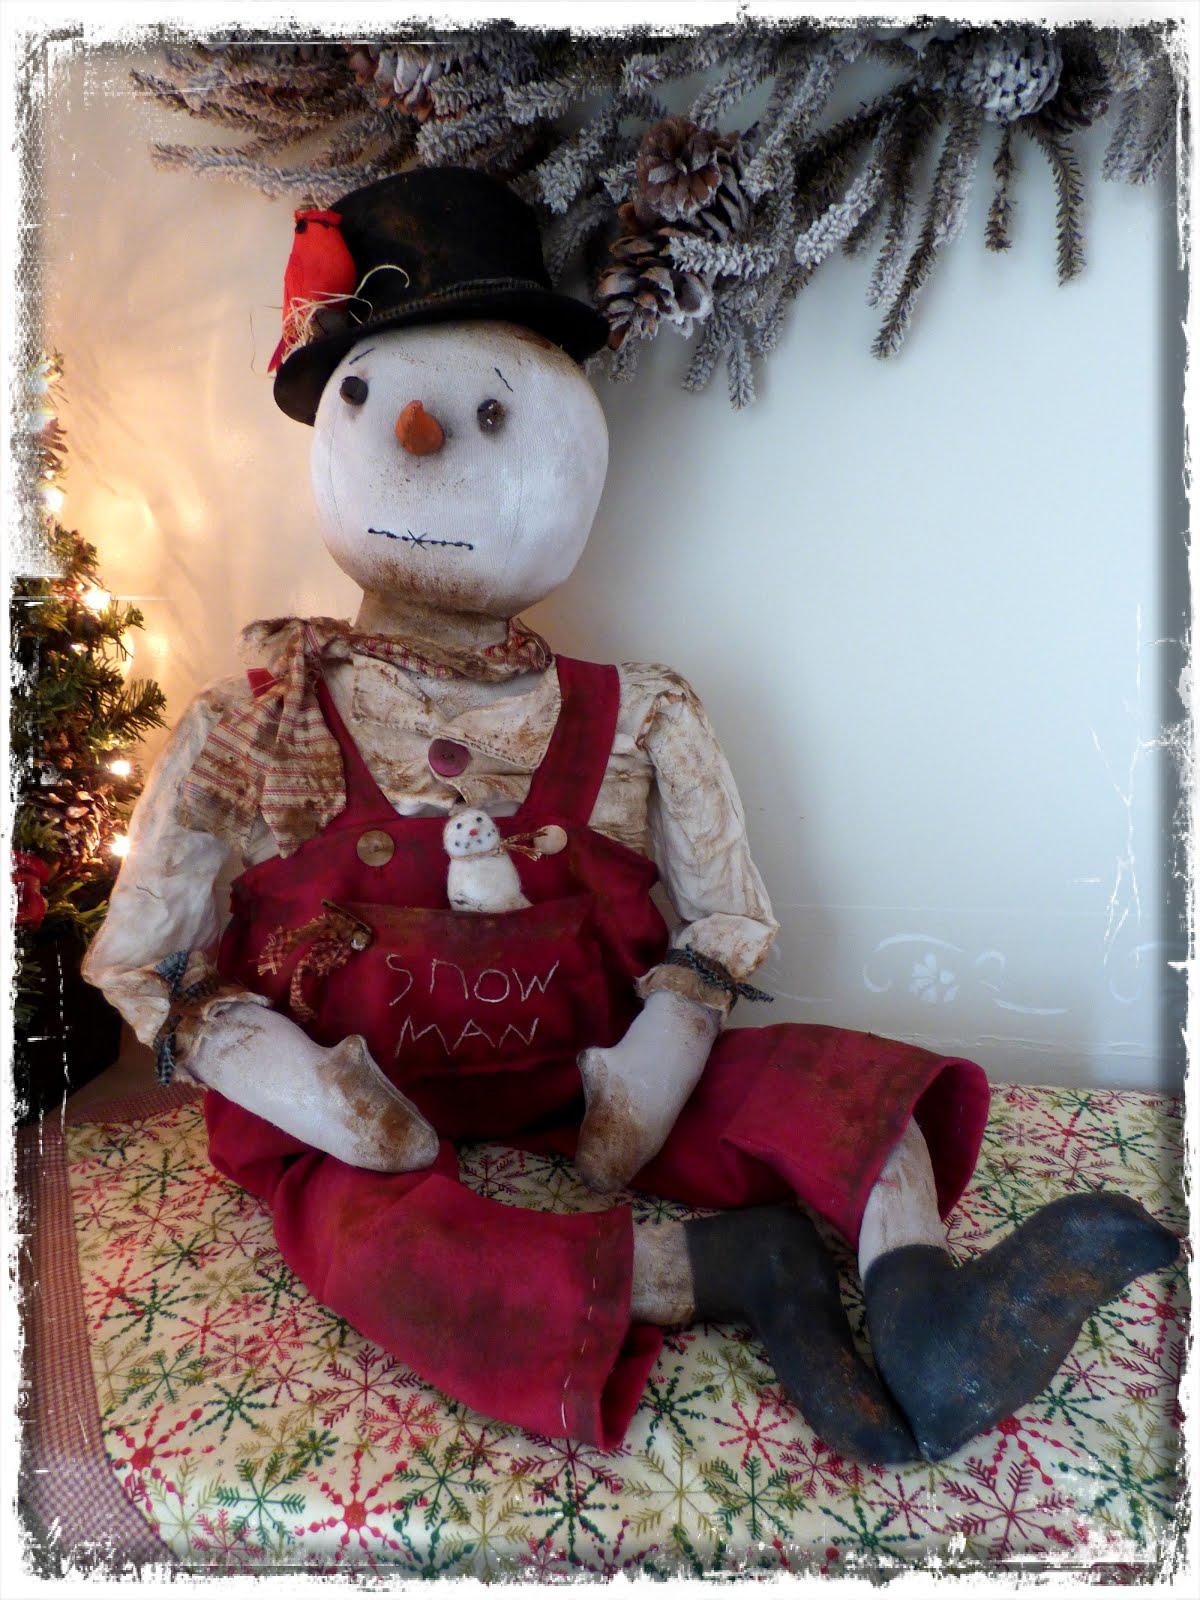 Melvin the snowman